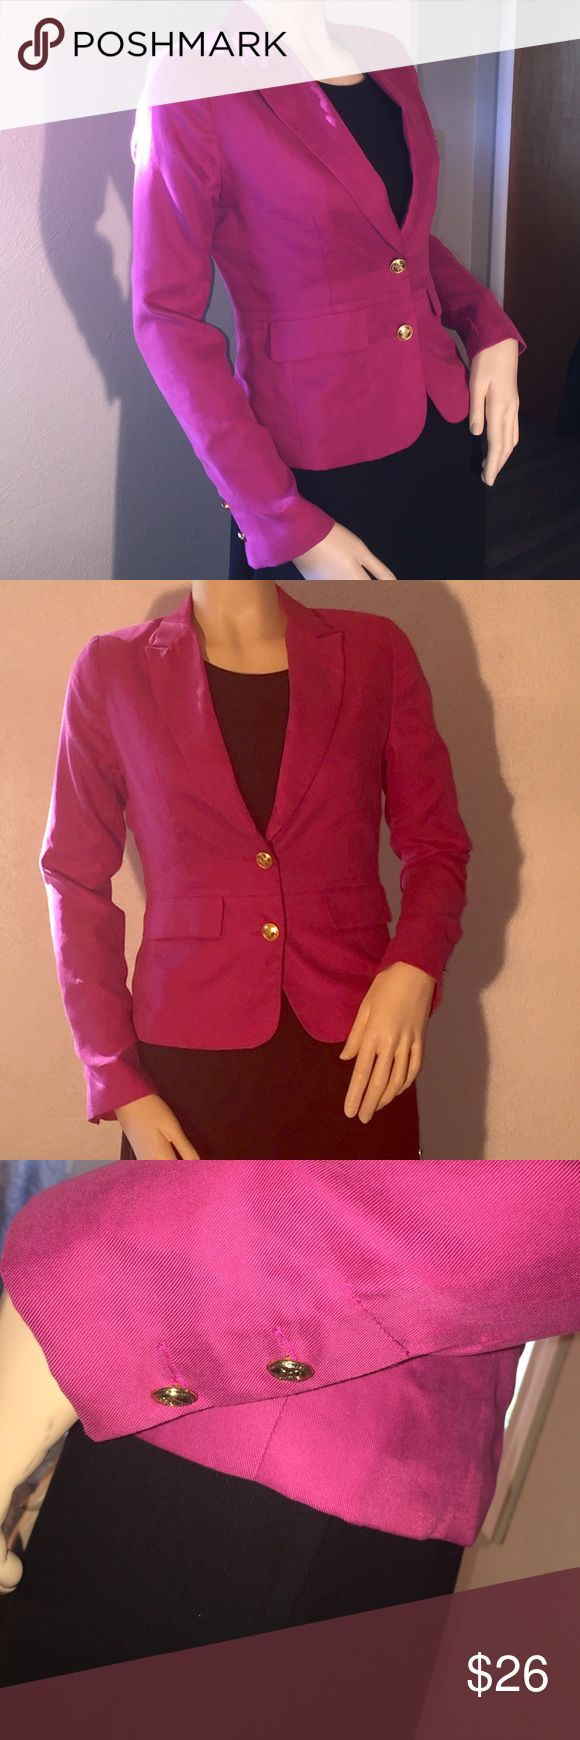 Cynthia Rowley Hot Pink Blazer Ladies hot pink blazer size Small by Cynthia Rowley. Jackets & Coats Blazers